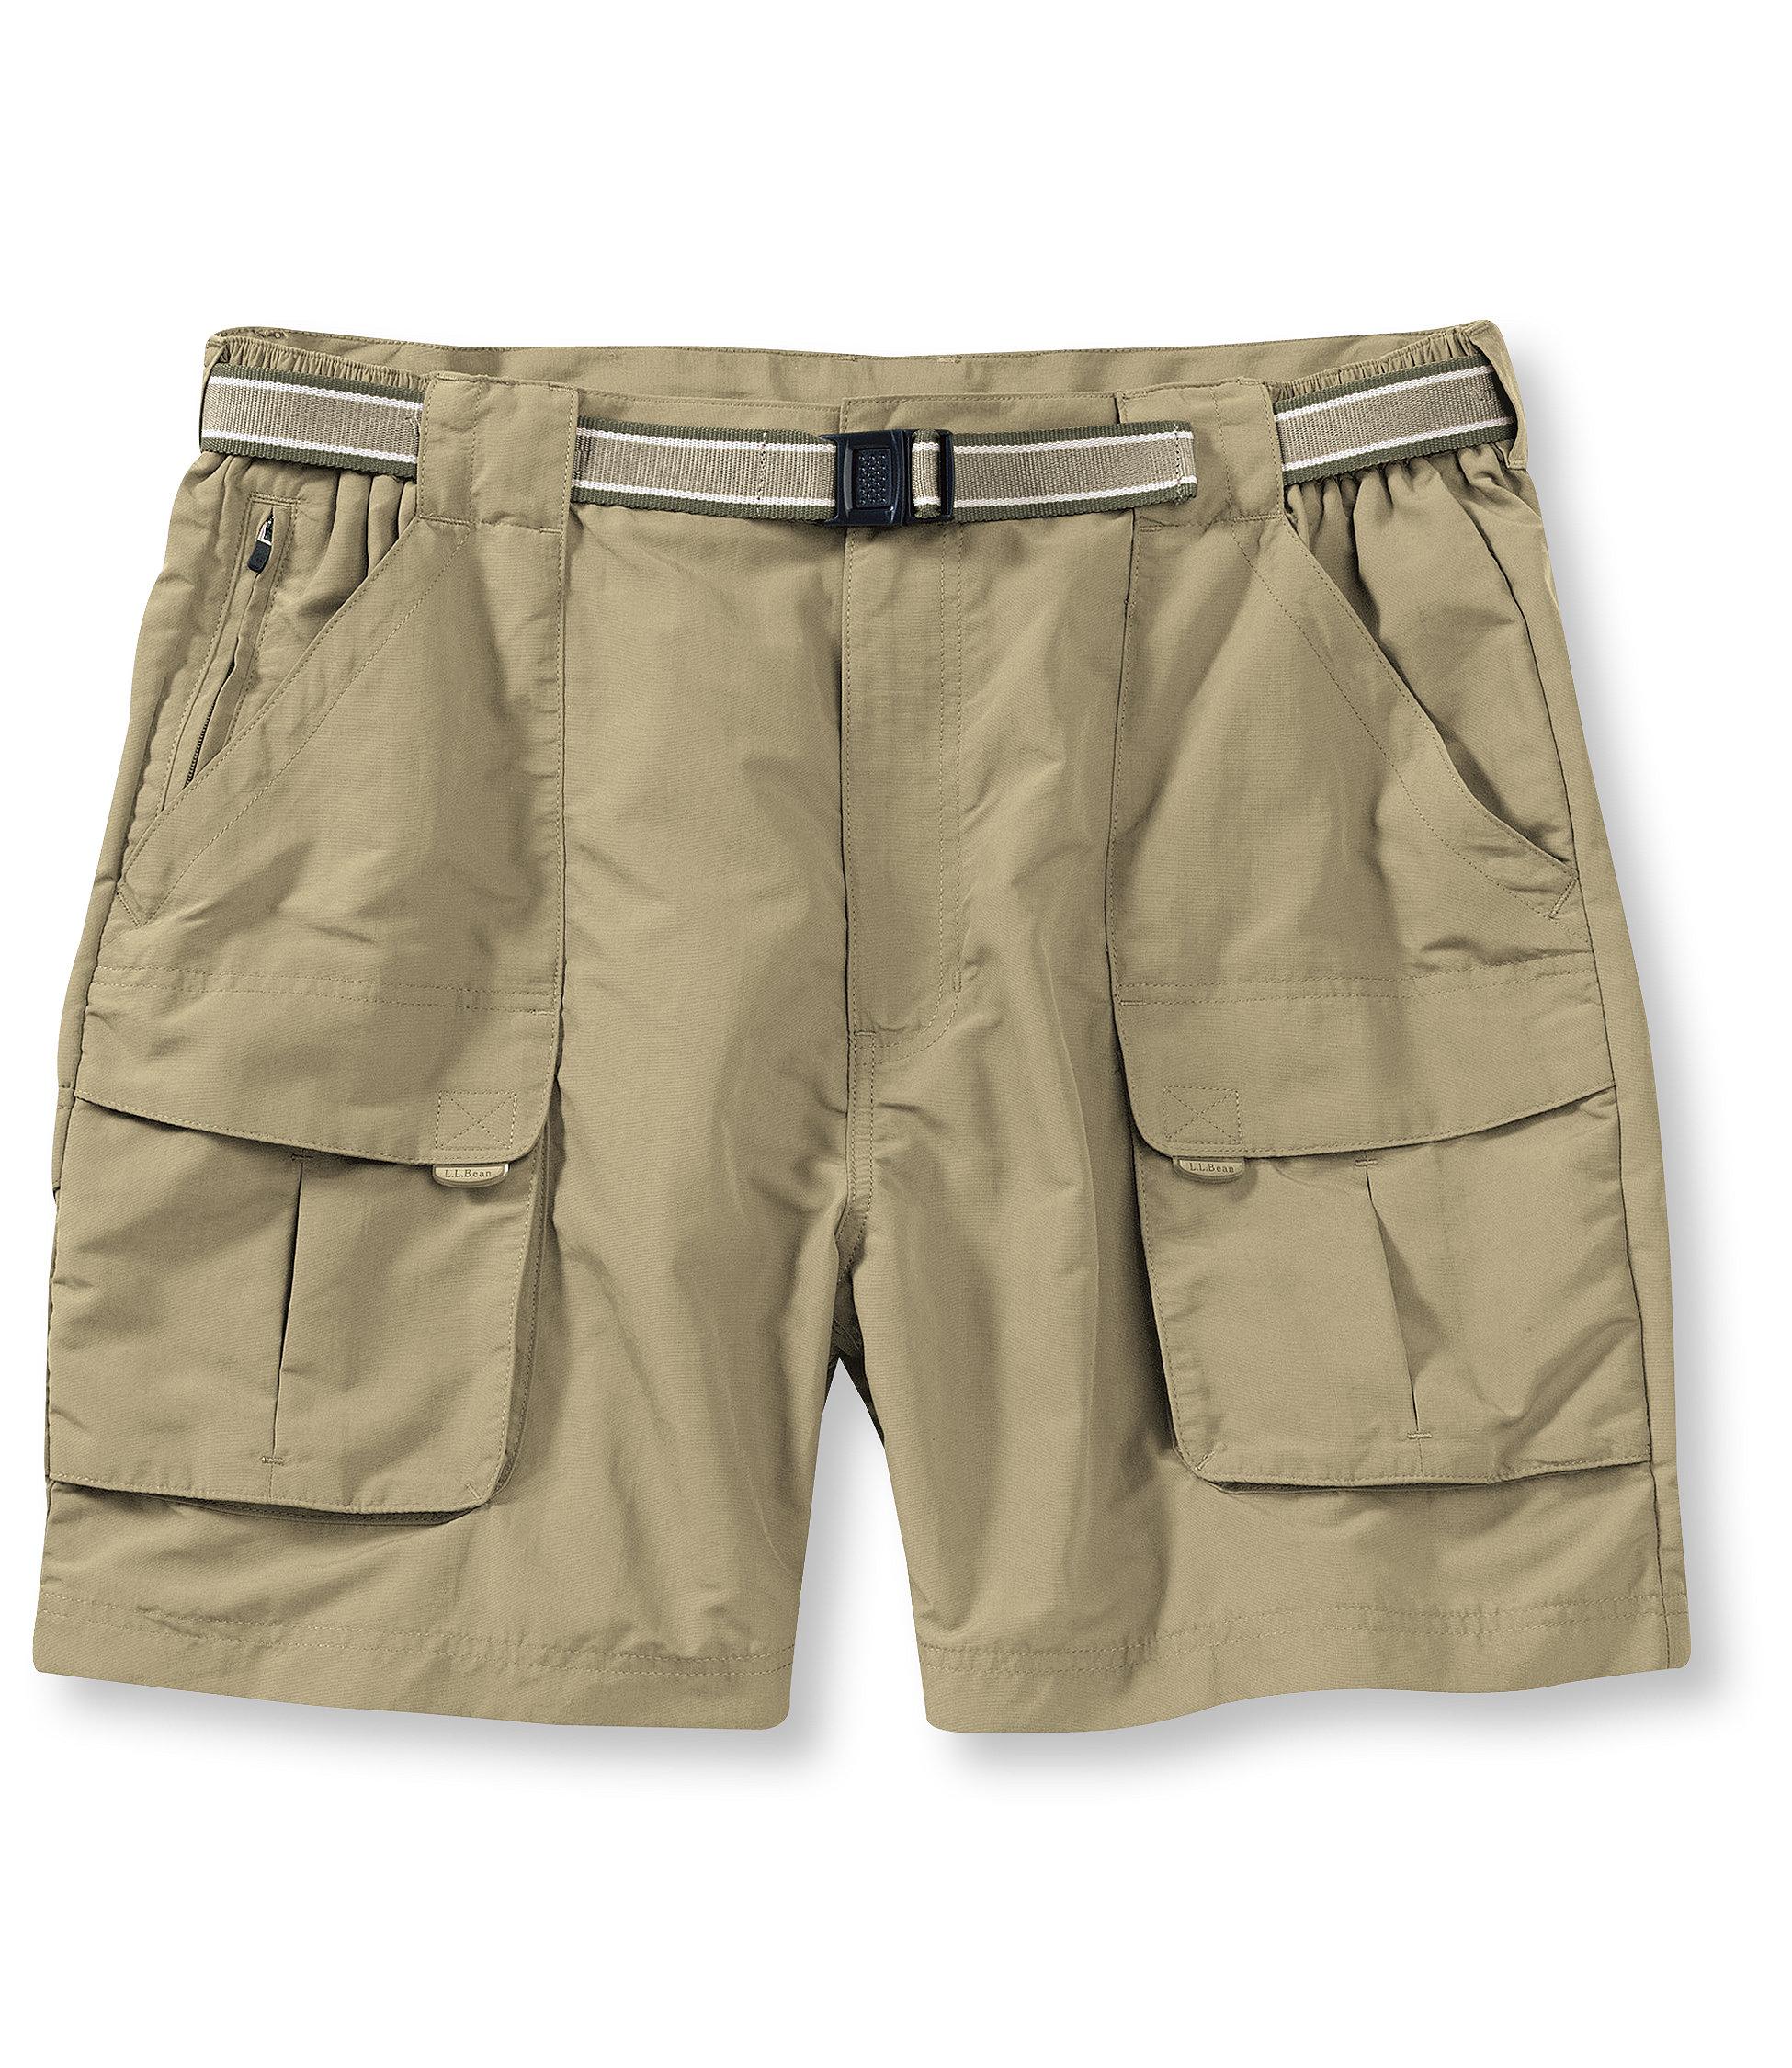 L.L.Bean Tropicwear Short